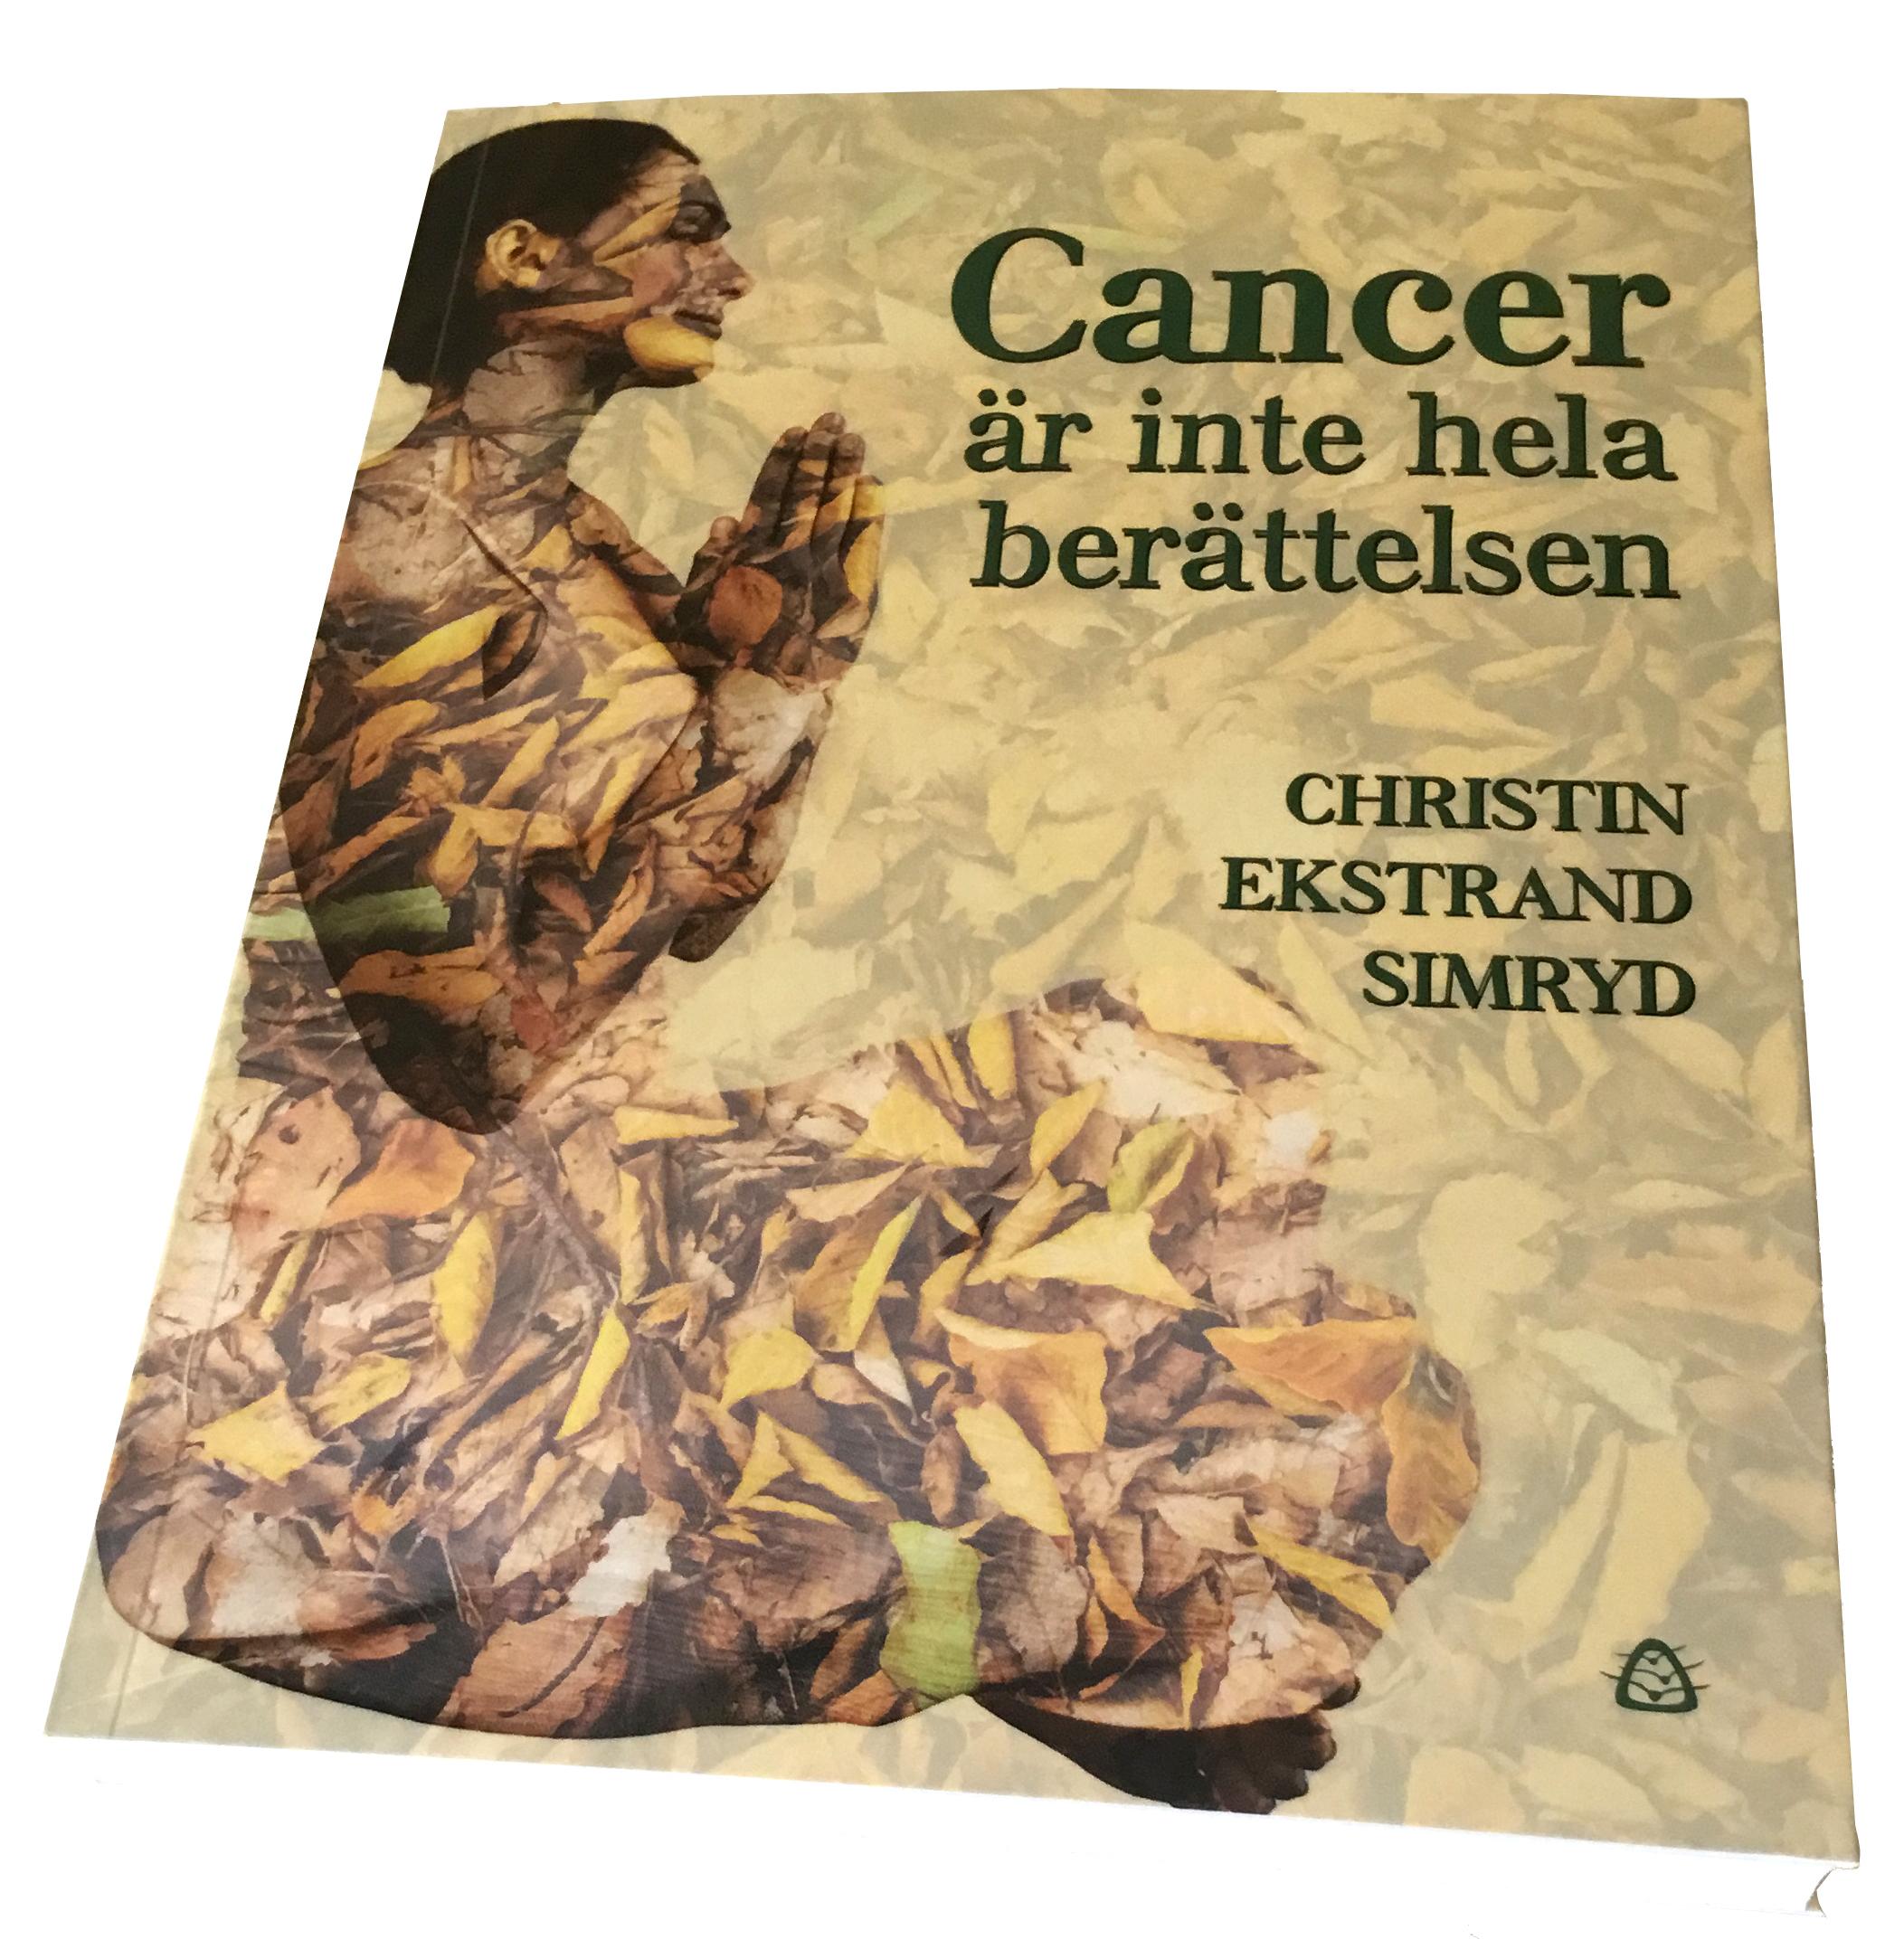 Cancer är inte hela berättelsen / Christin Ekstrand Simryd